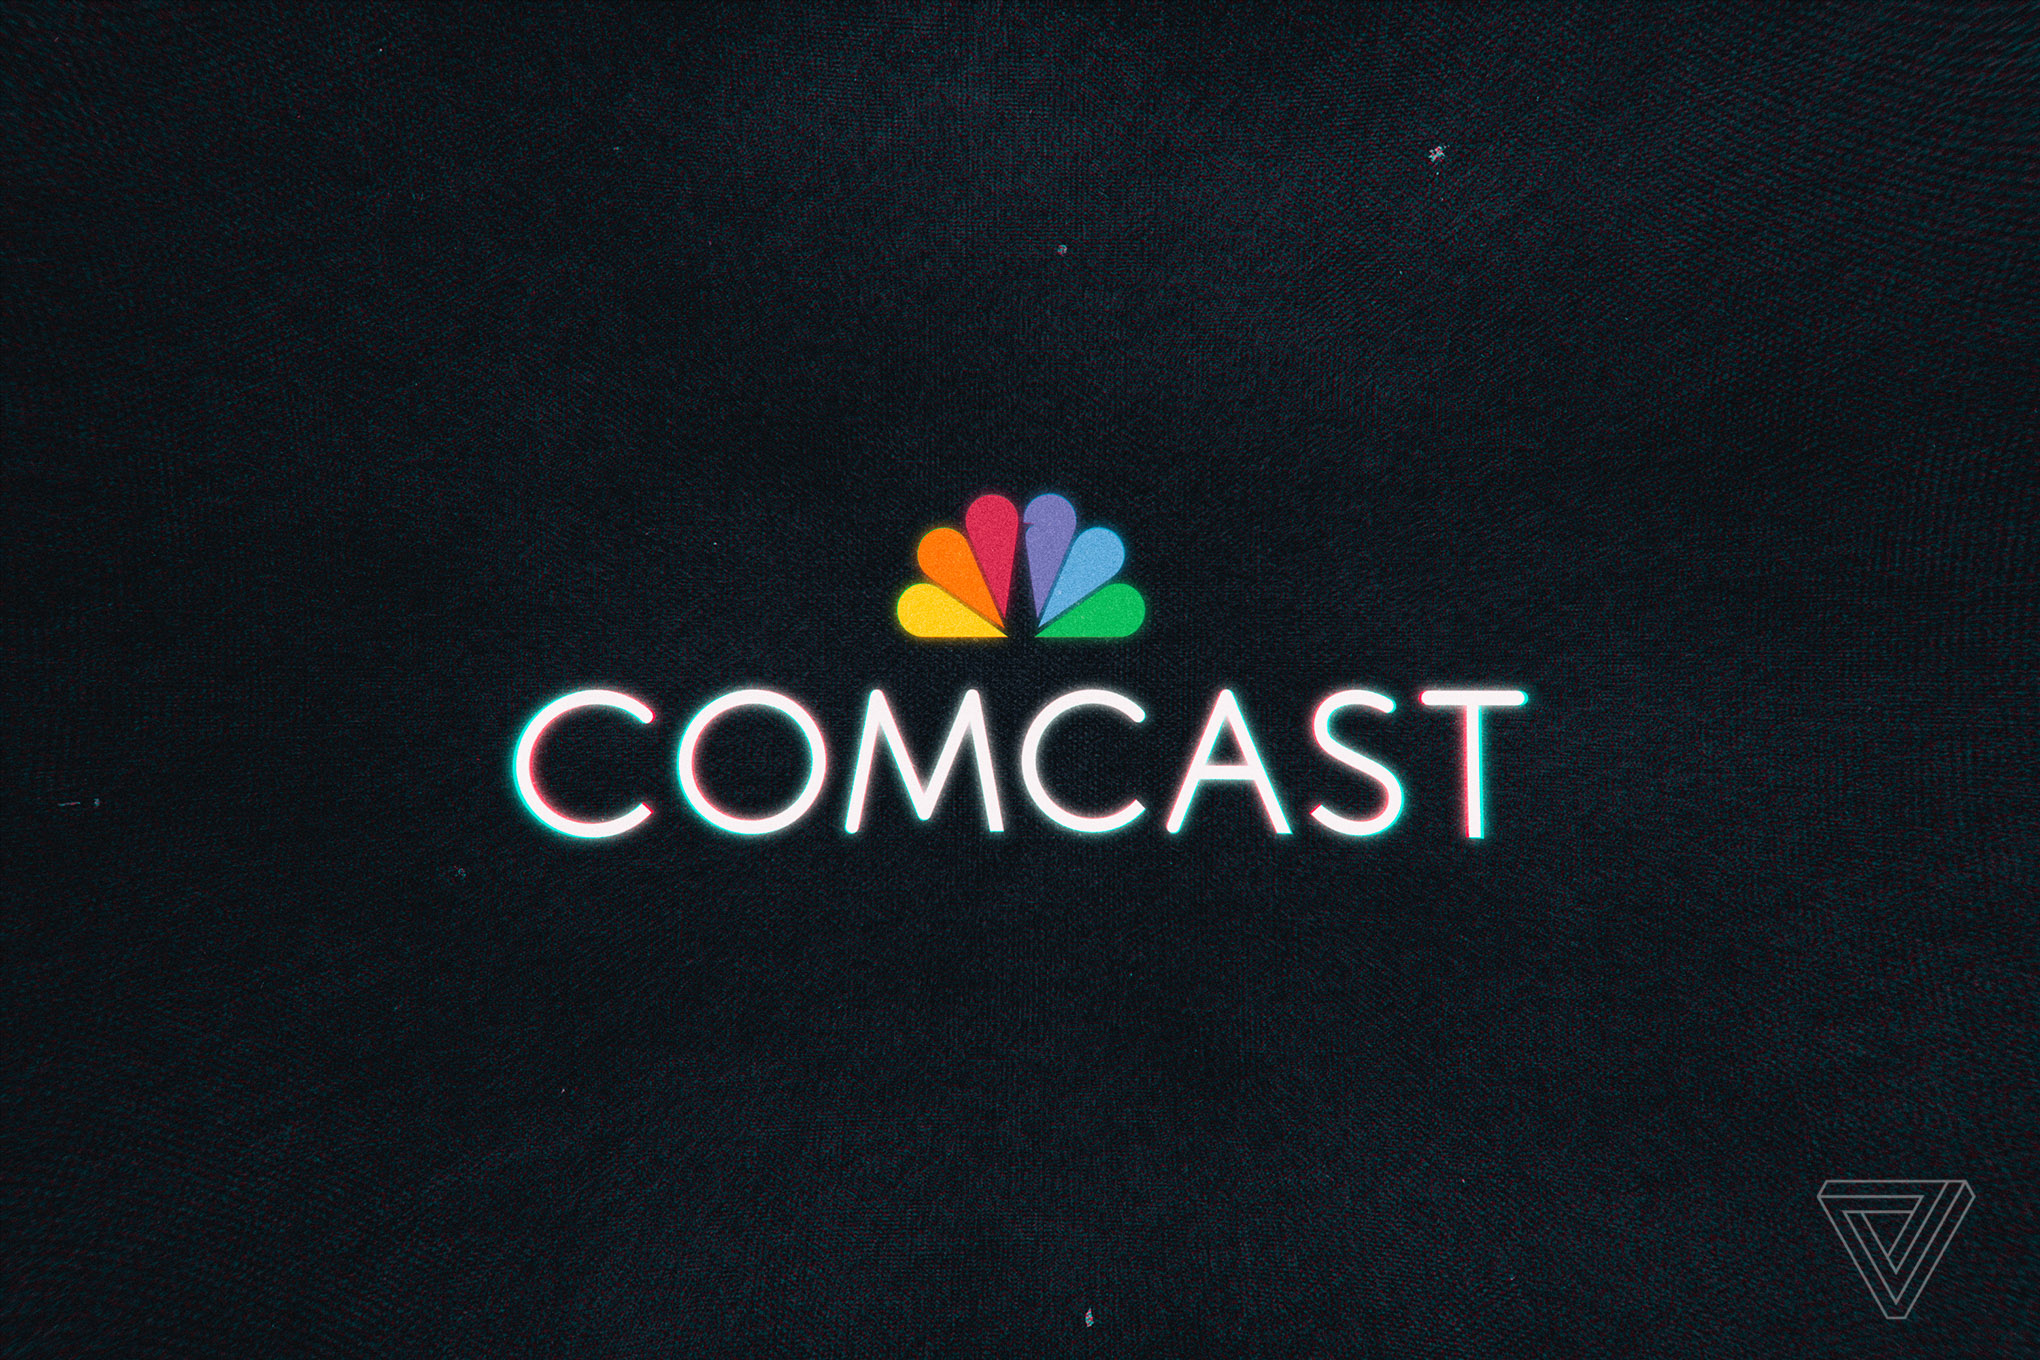 Comcast - The Verge